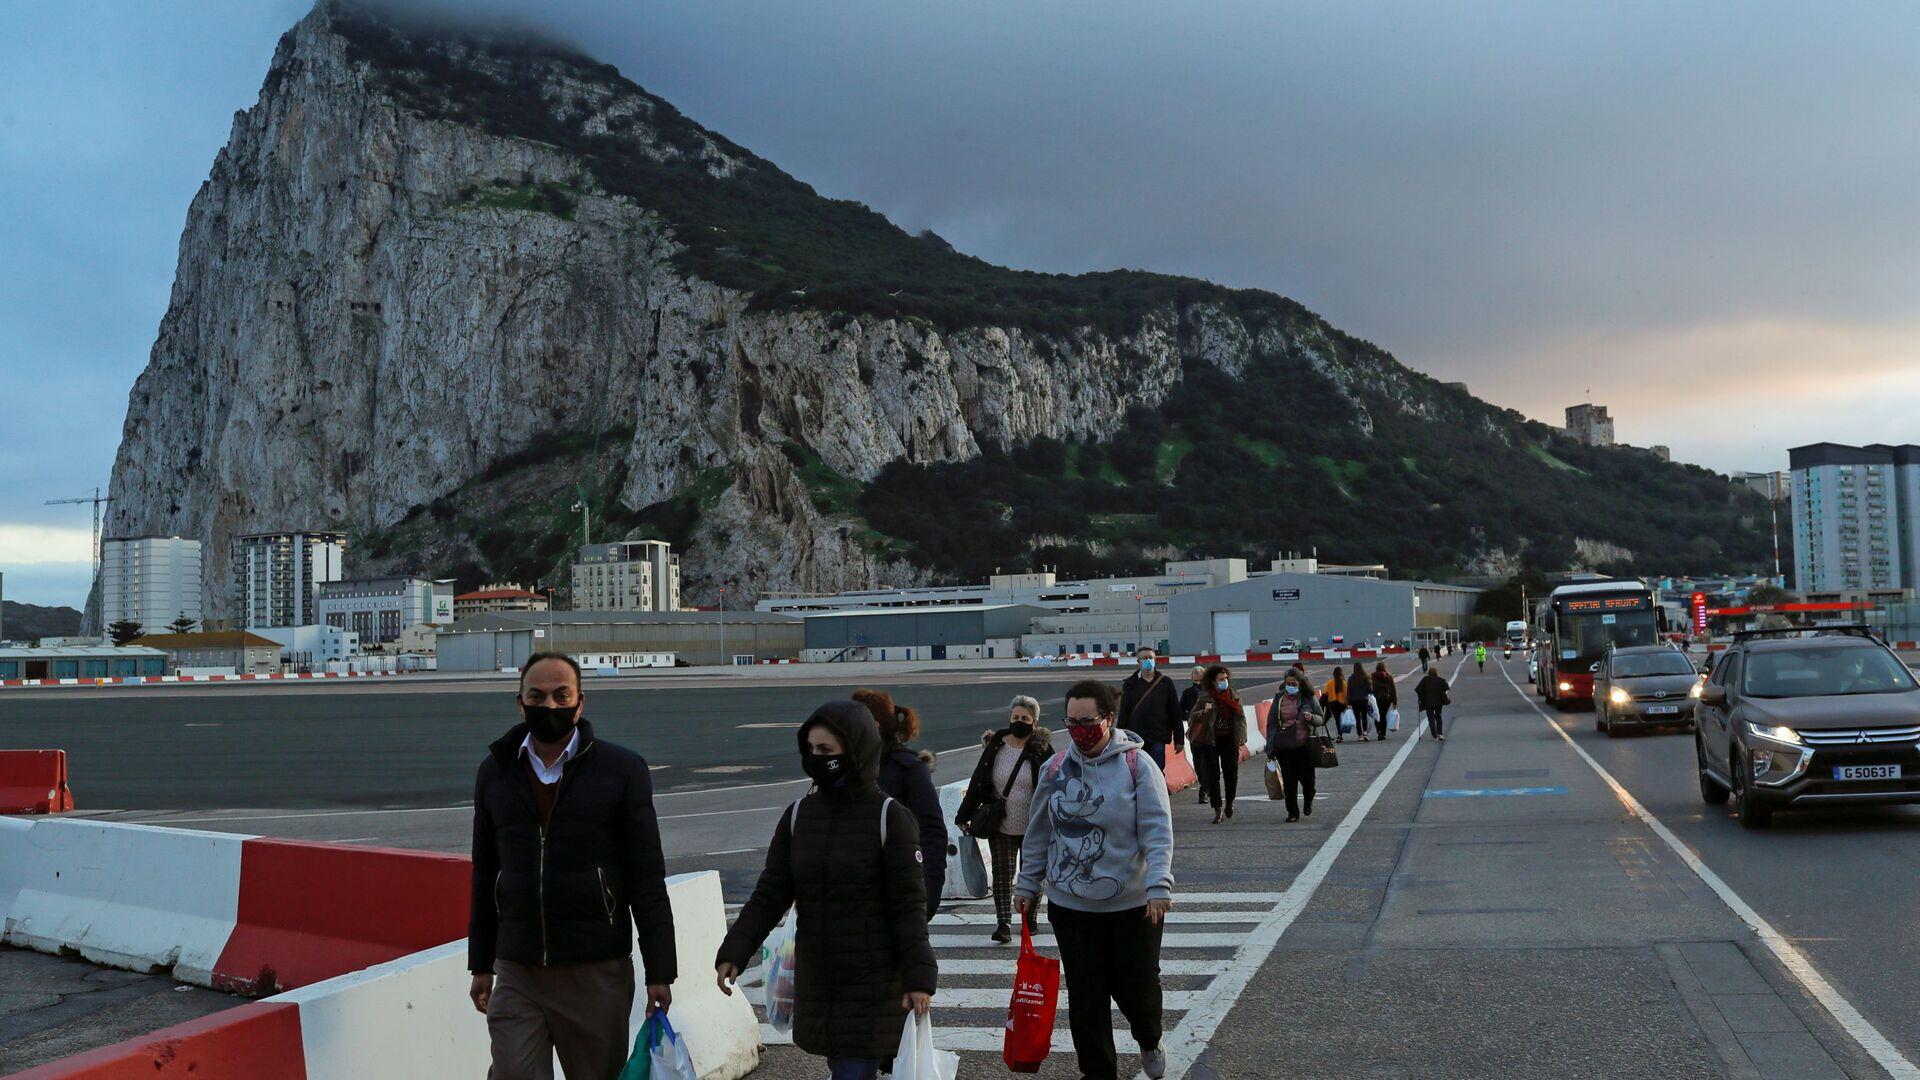 La gente en mascarillas en Gibraltar - Sputnik Mundo, 1920, 19.03.2021